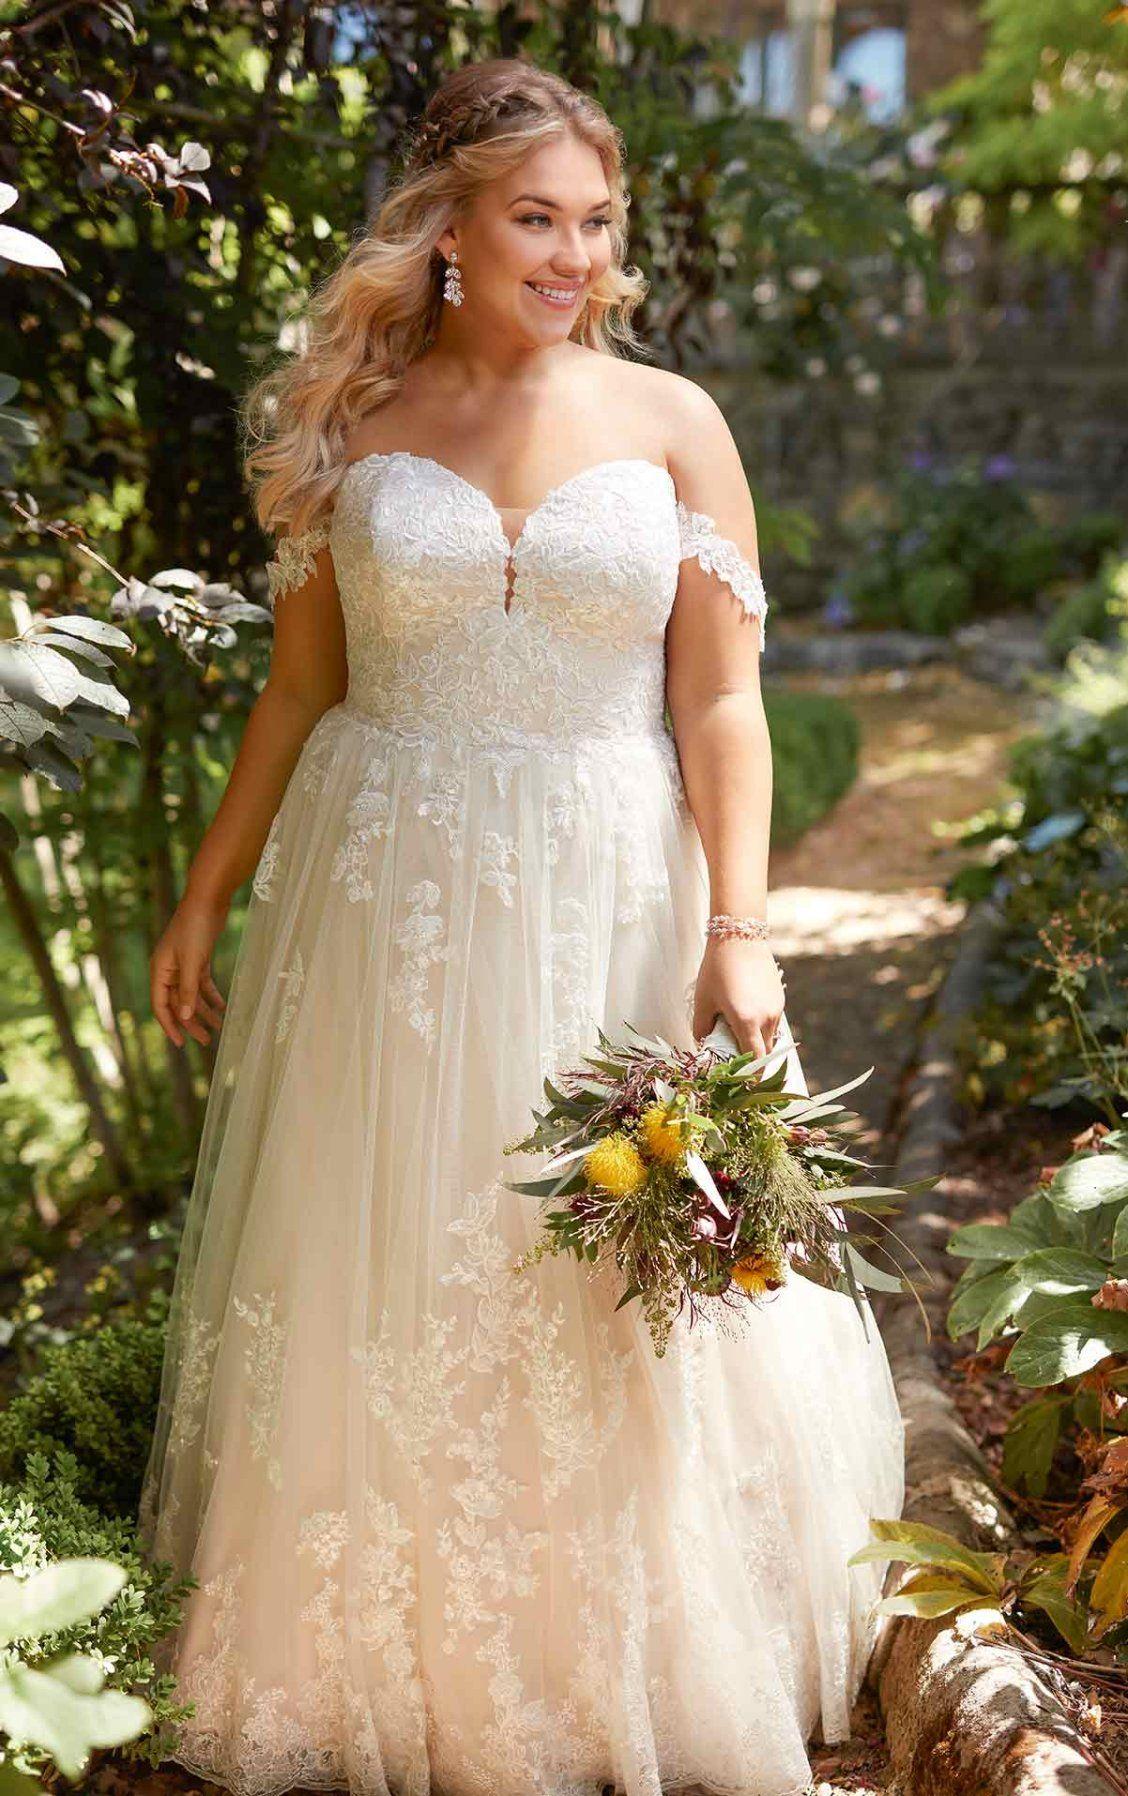 Mermaid wedding dress with rich beadwork in plus size wedding